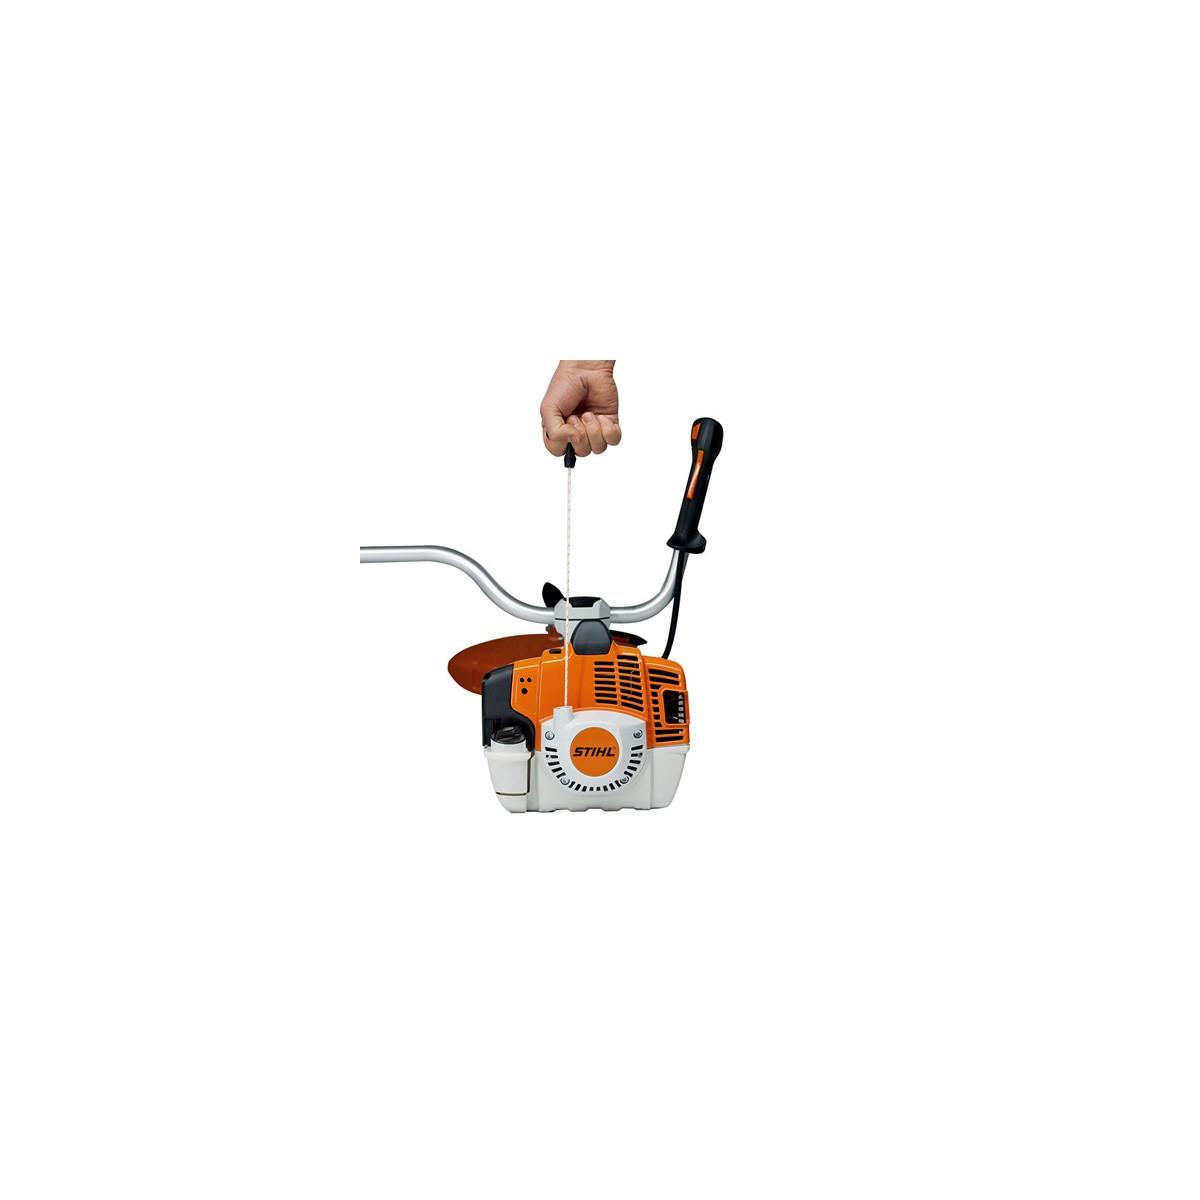 achat debroussailleuse stihl fs 260 ce stihl bender motoculture. Black Bedroom Furniture Sets. Home Design Ideas